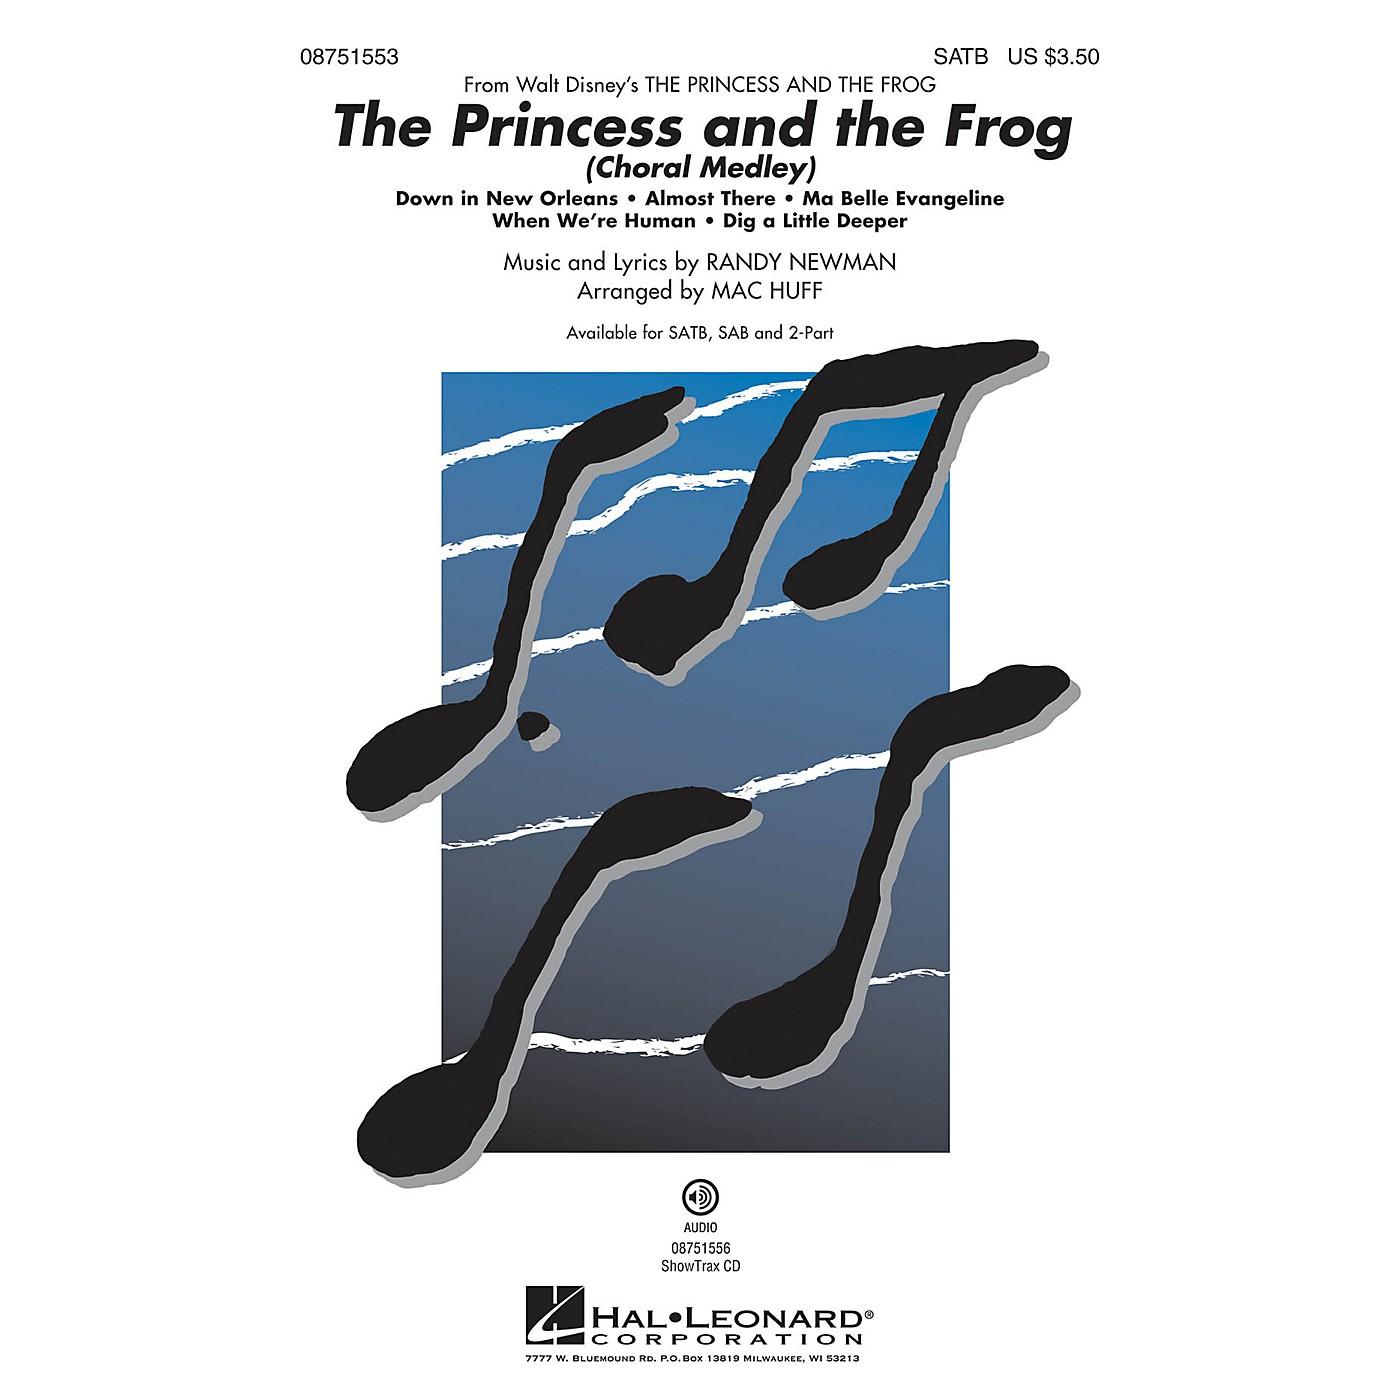 Hal Leonard The Princess and the Frog (Choral Medley) SATB arranged by Mac Huff thumbnail